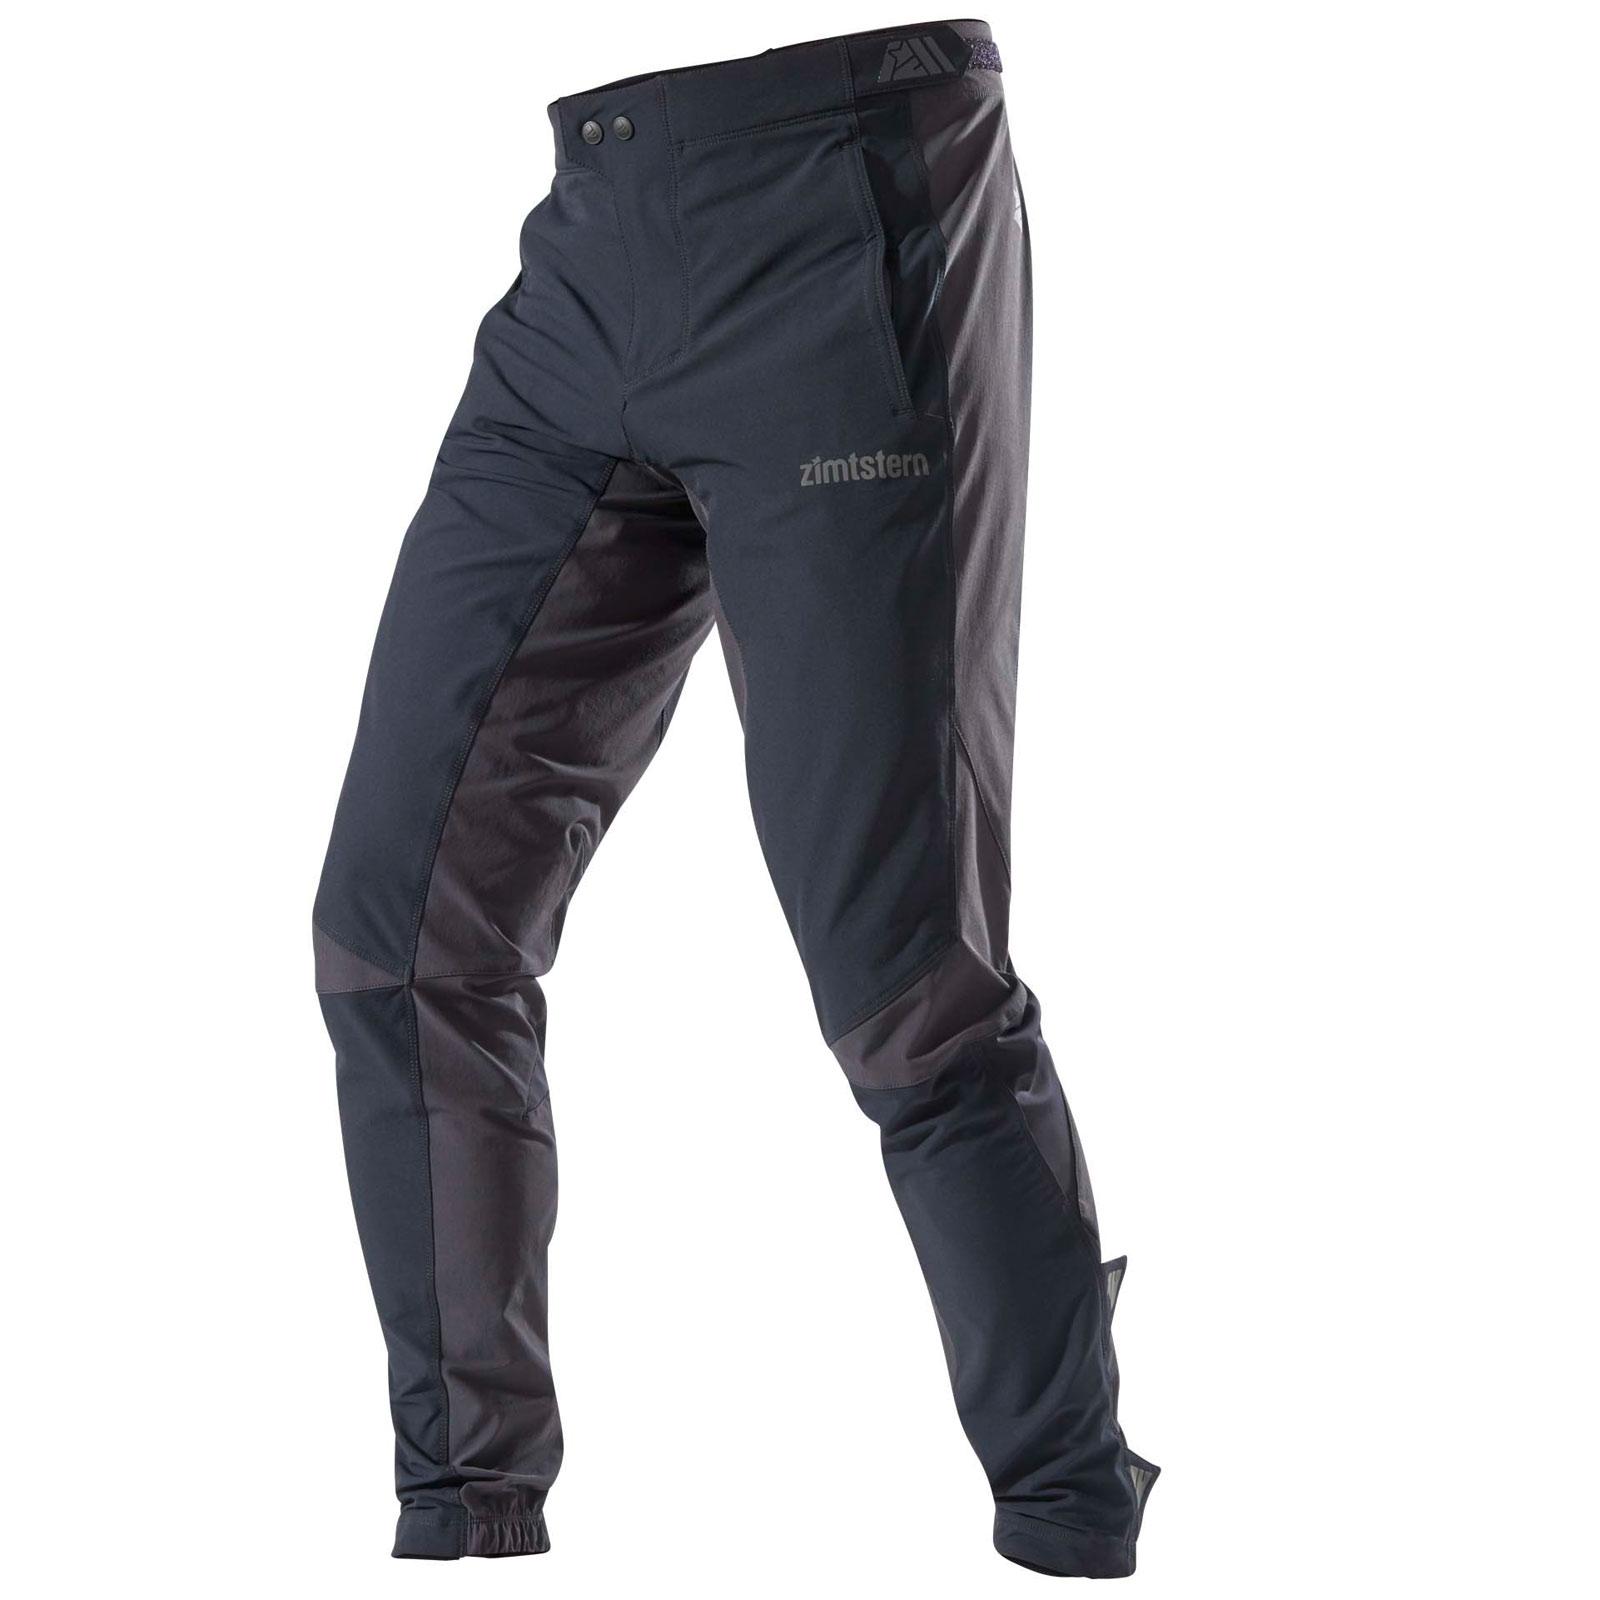 Zimtstern Shelterz MTB Softshell Pants - pirate black